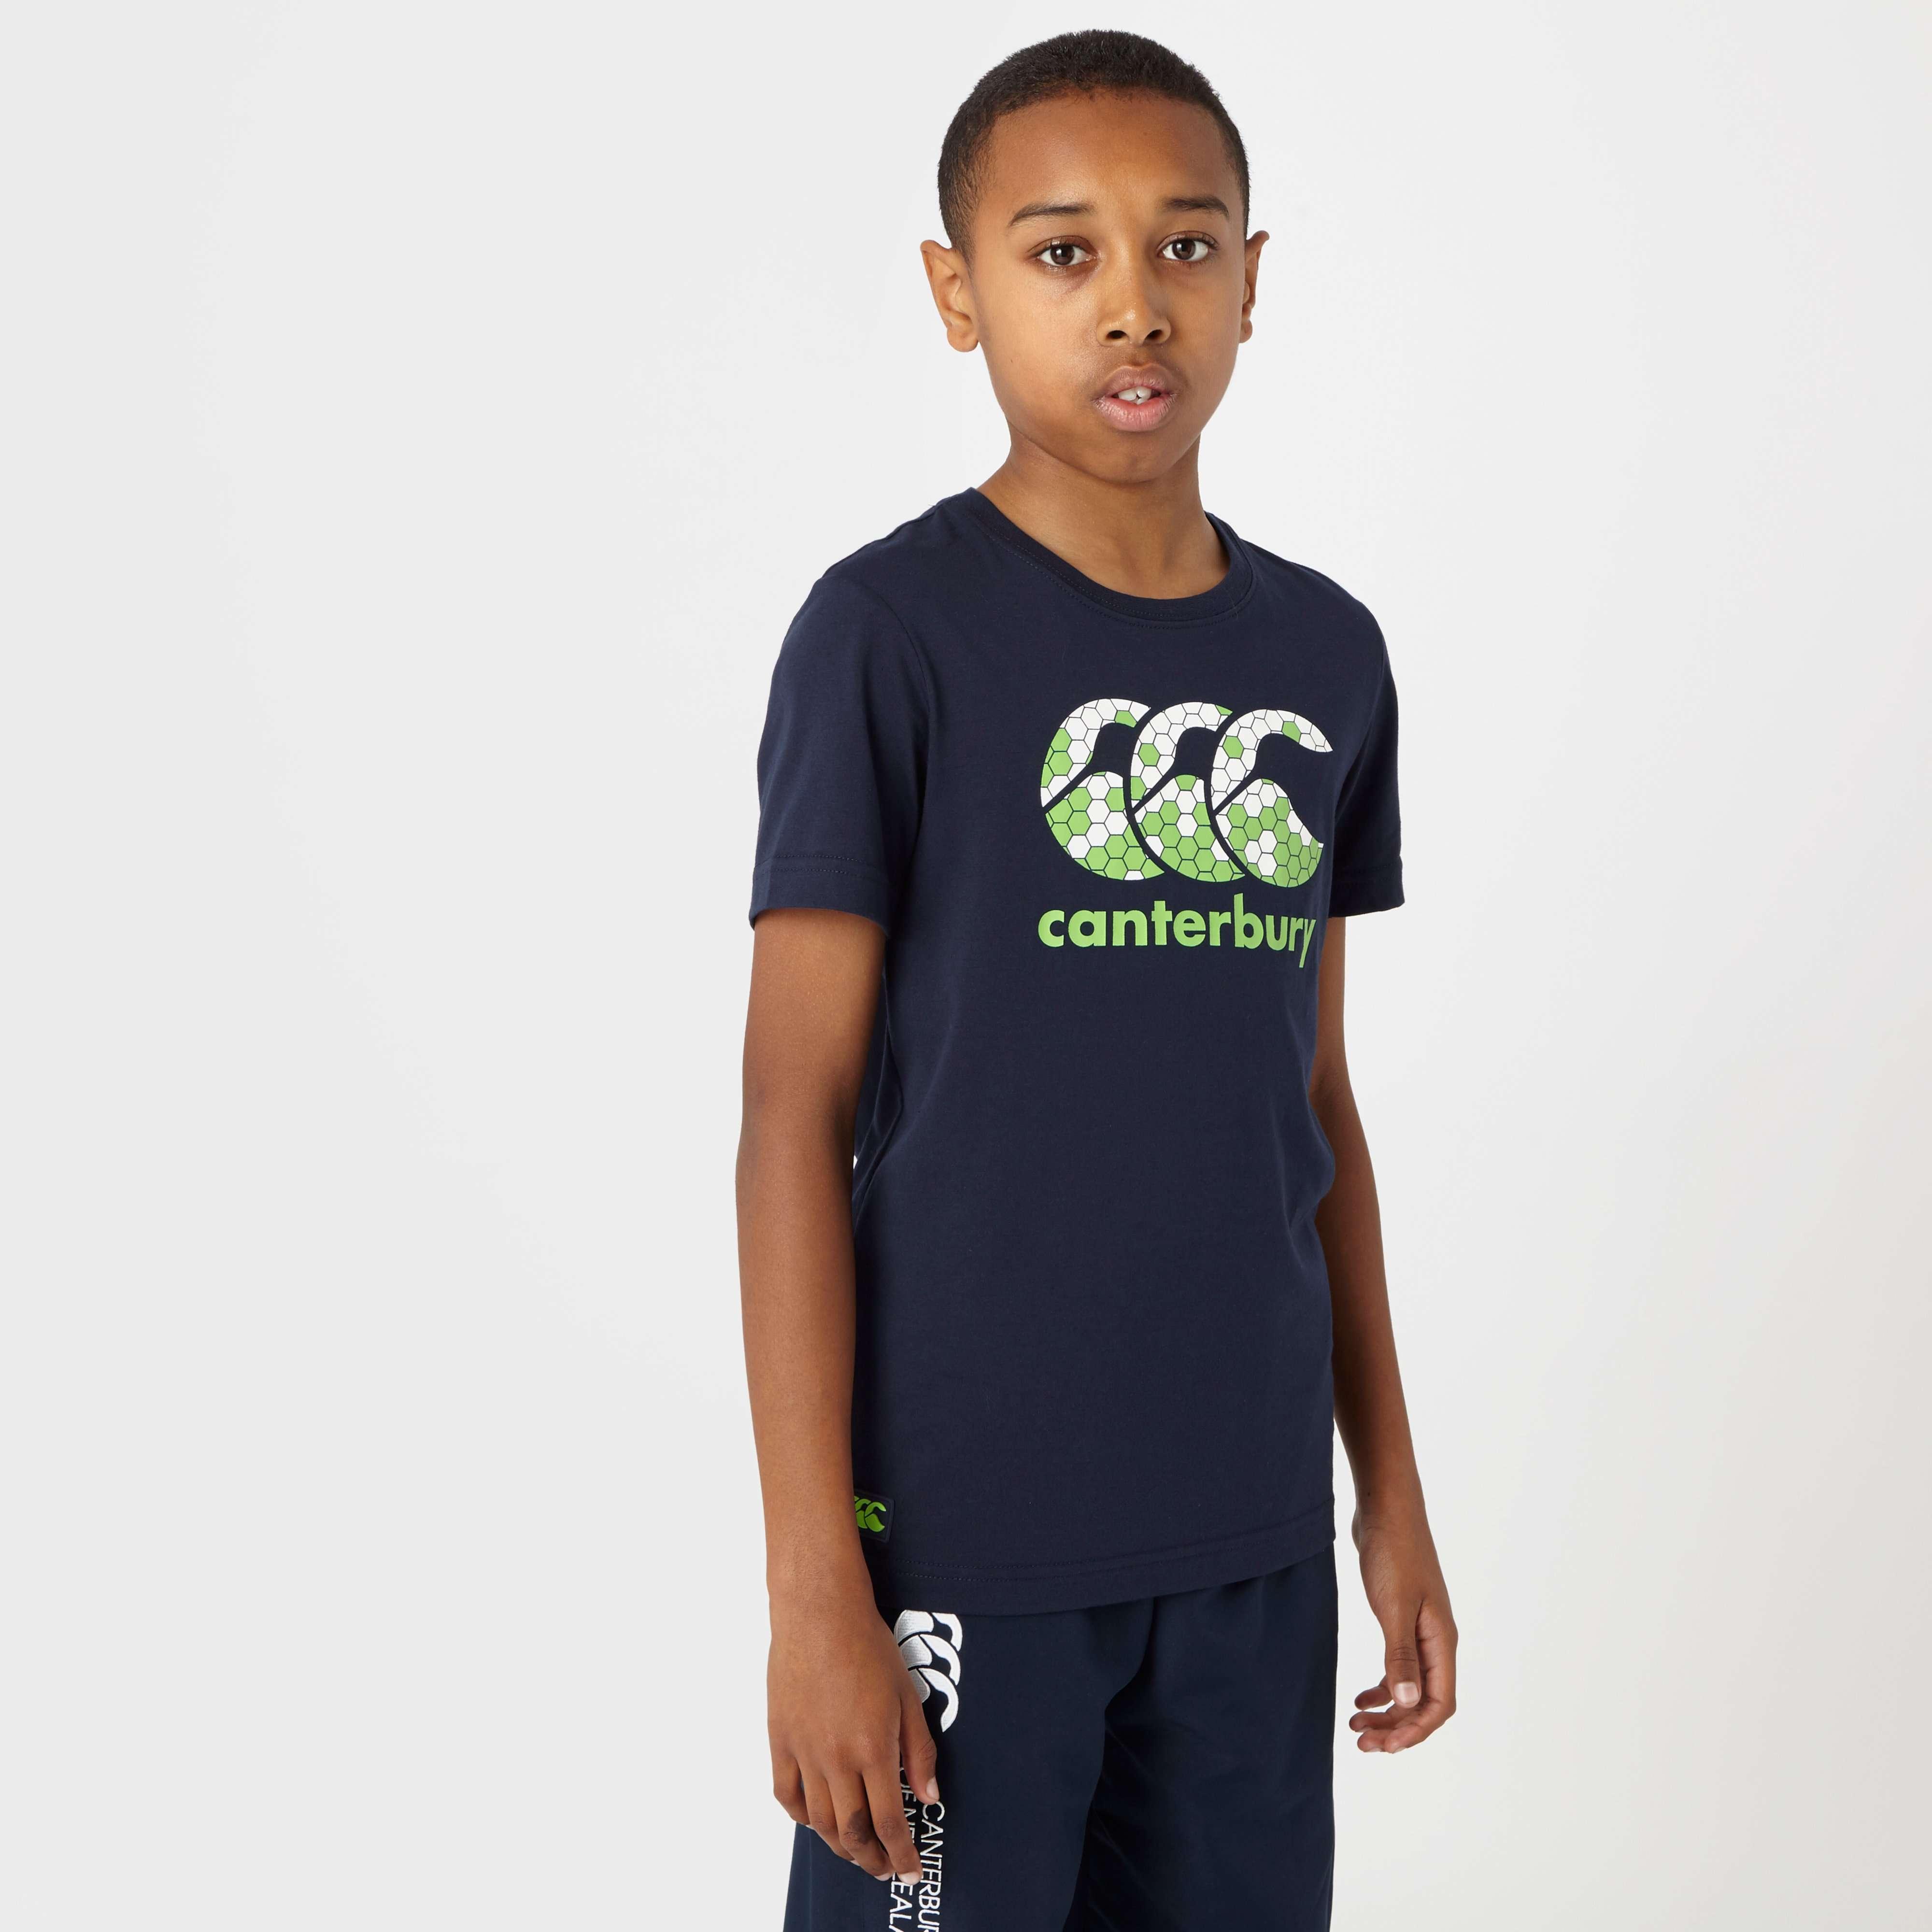 CANTERBURY Kid's Logo Tee